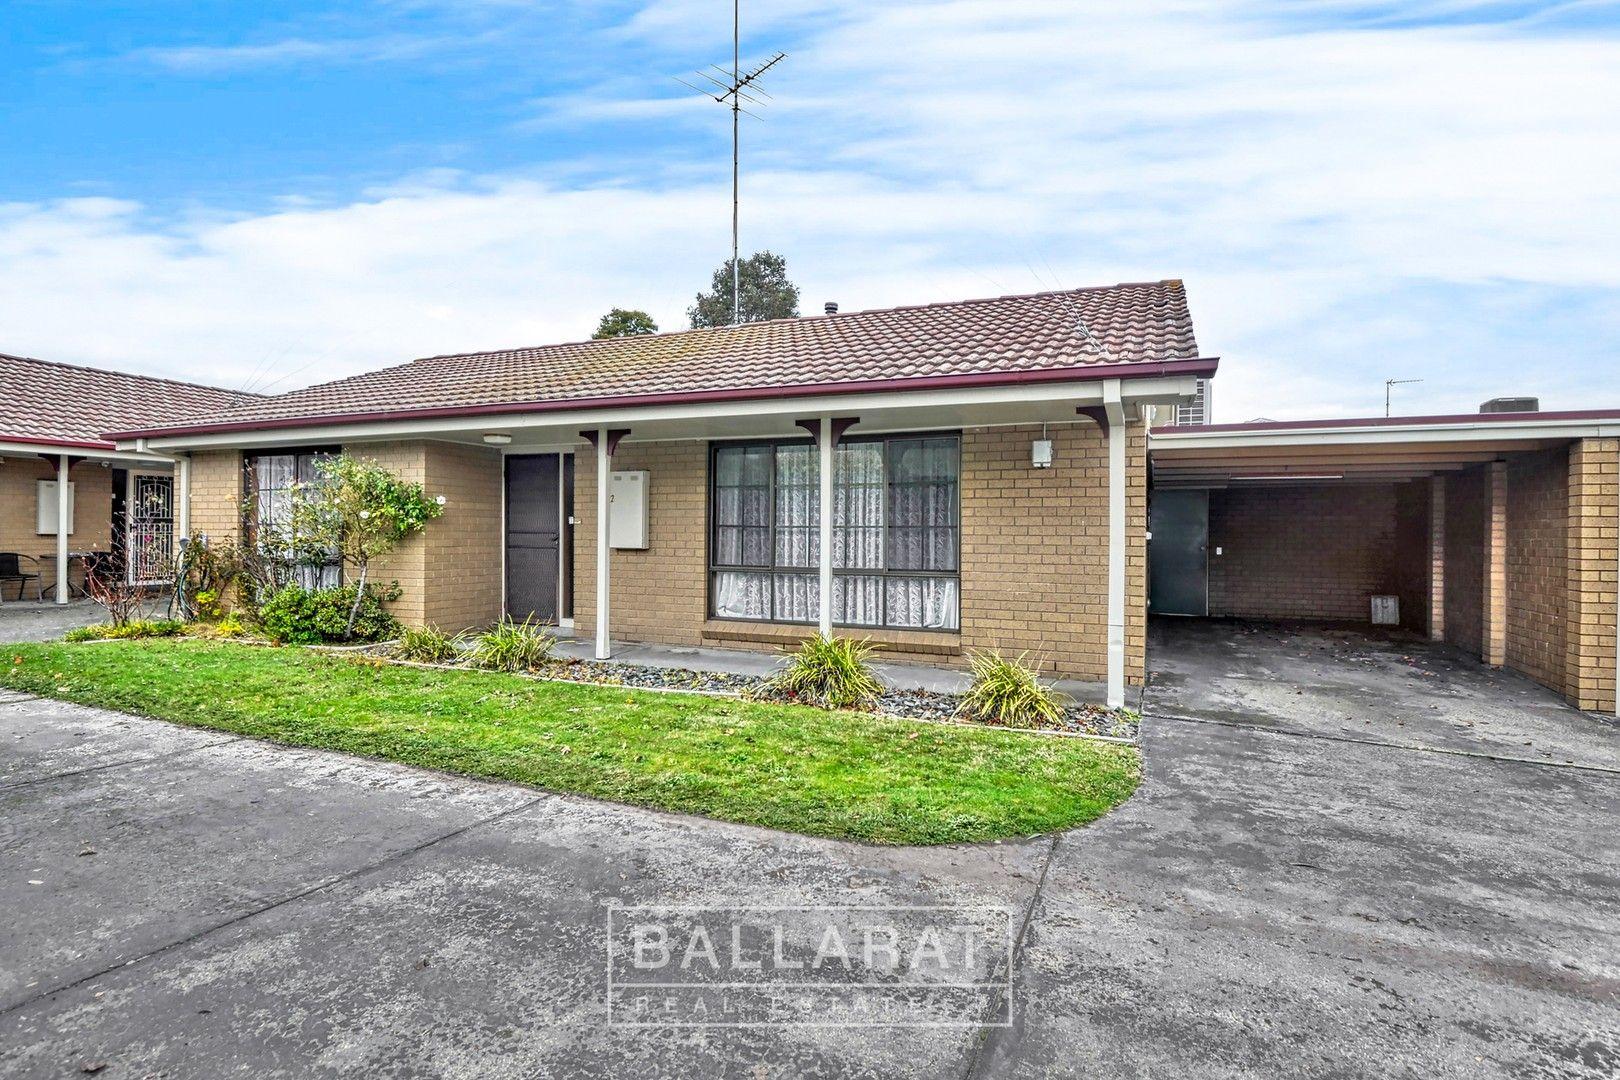 2/205 Ripon  Street South, Ballarat Central VIC 3350, Image 0